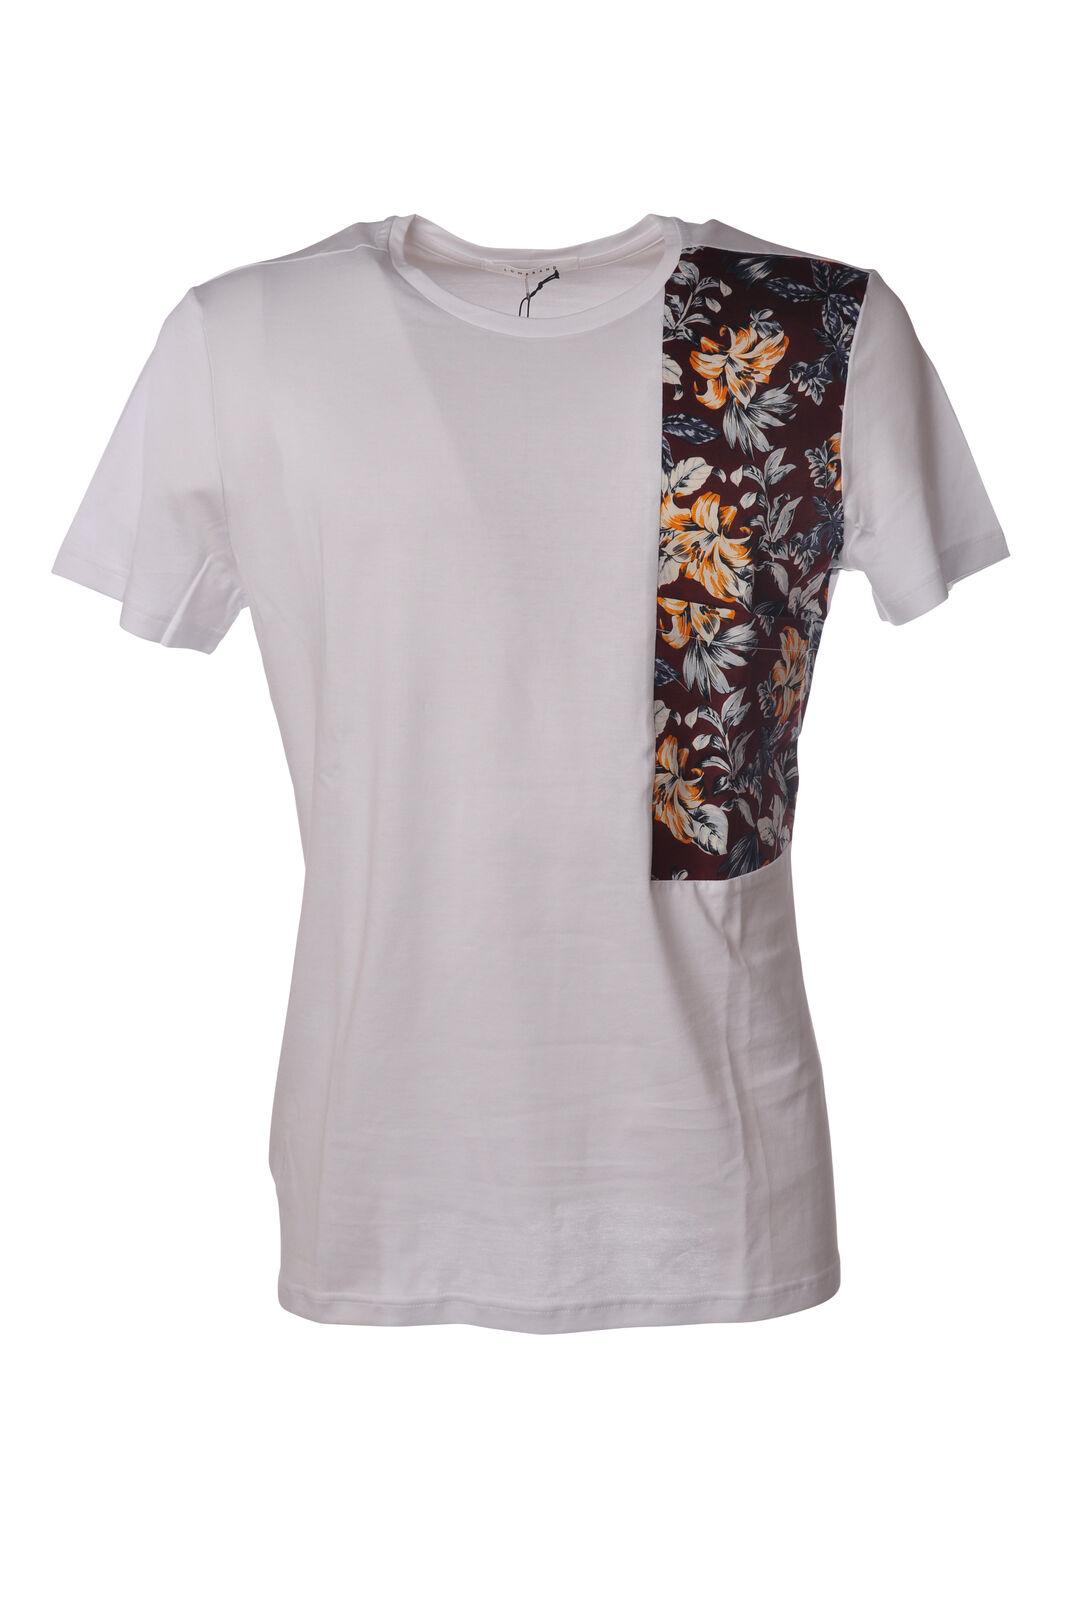 Niedrig Brand - Topwear-T-shirts - Man - Weiß - 5251908G185317